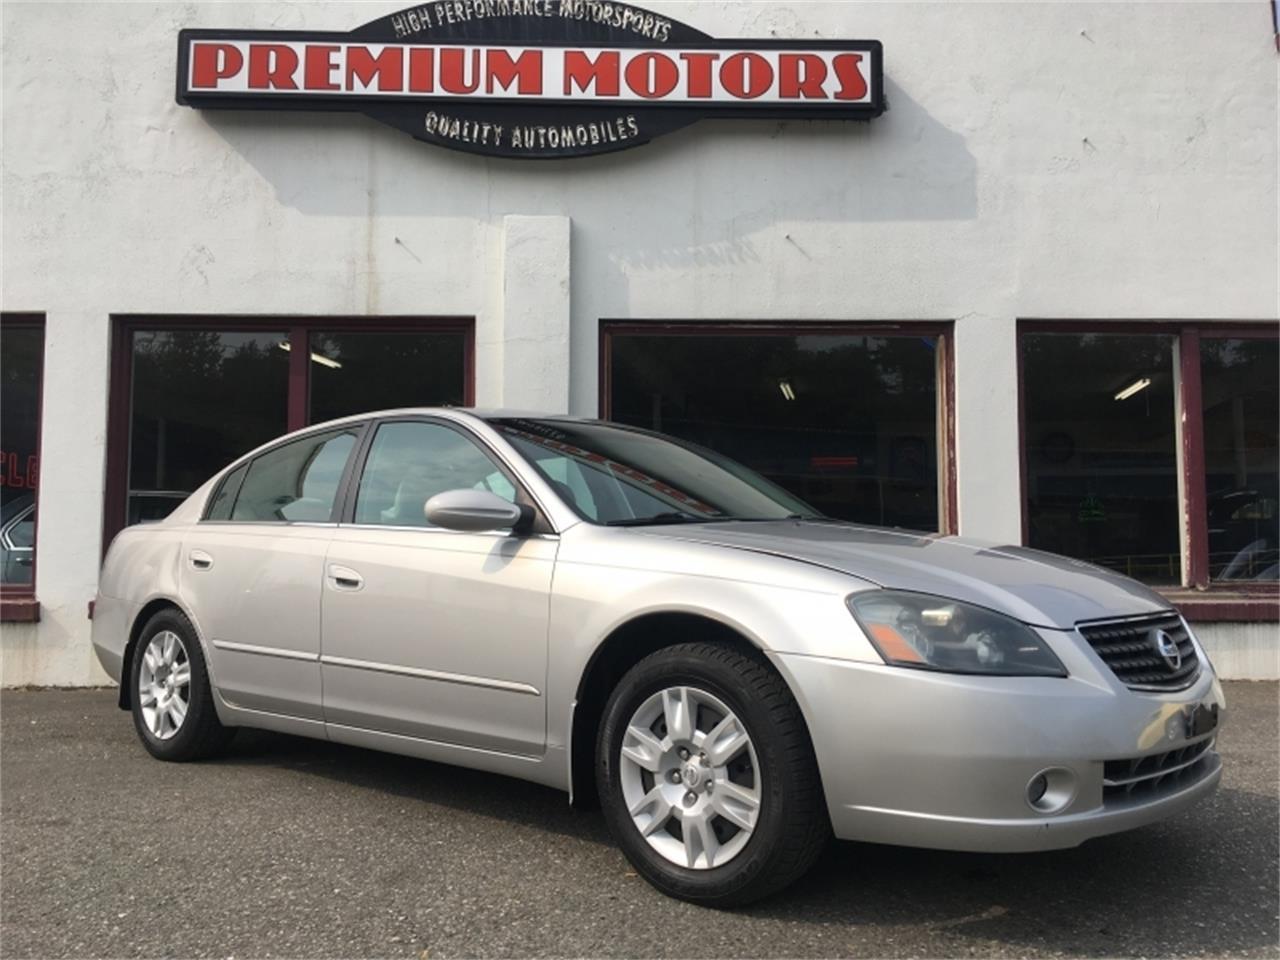 2005 Nissan Altima For Sale >> For Sale 2005 Nissan Altima In Tocoma Washington